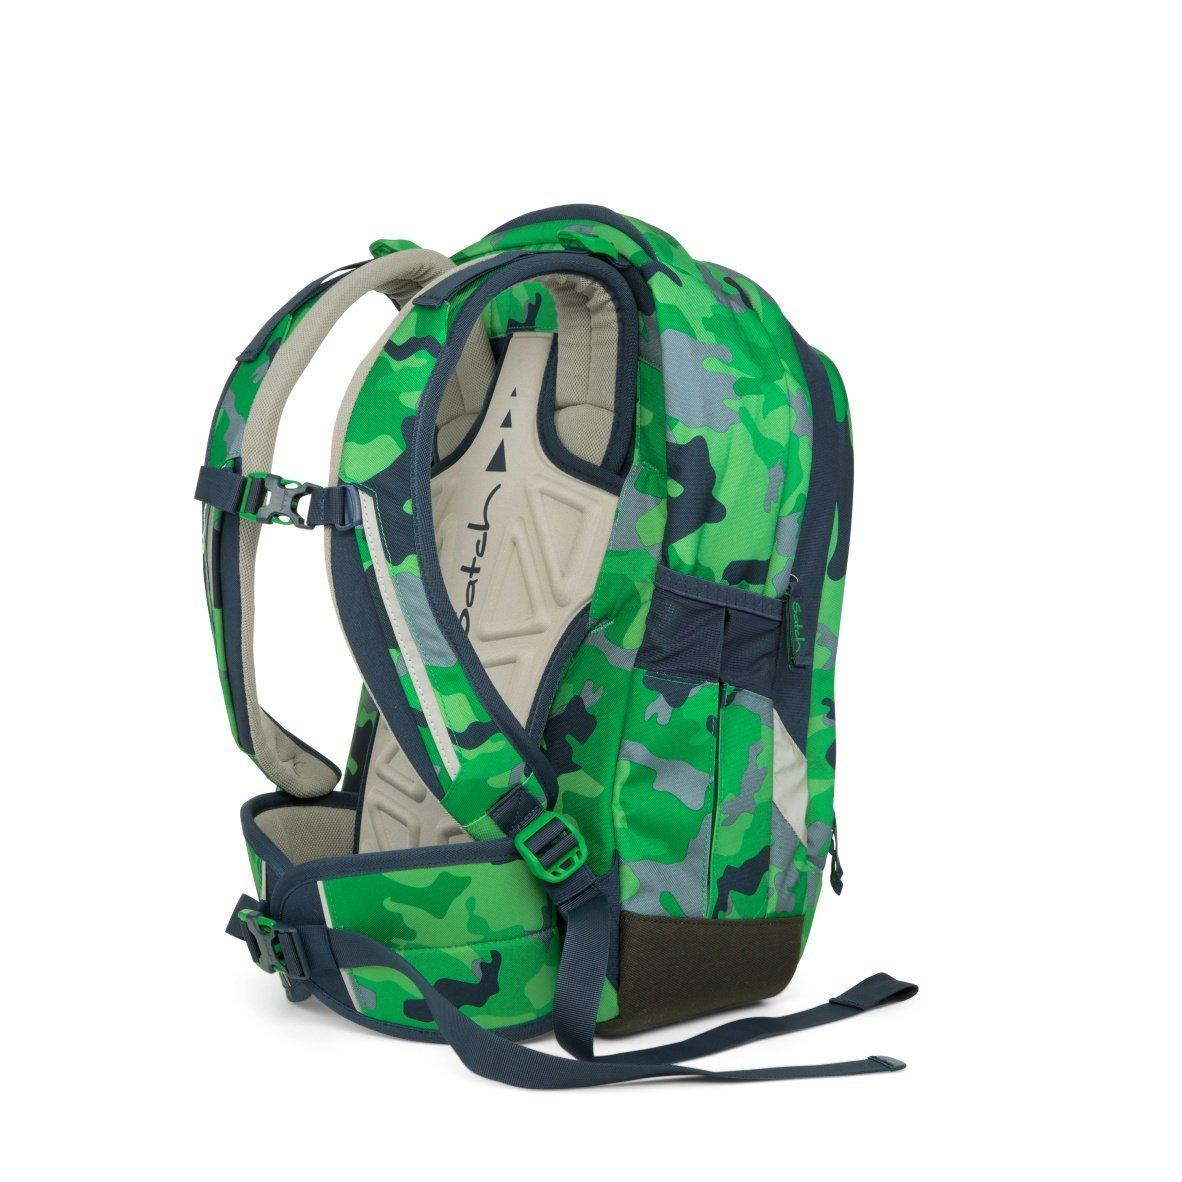 Рюкзак Ergobag Satch Sleek цвет Green Camou, - фото 6